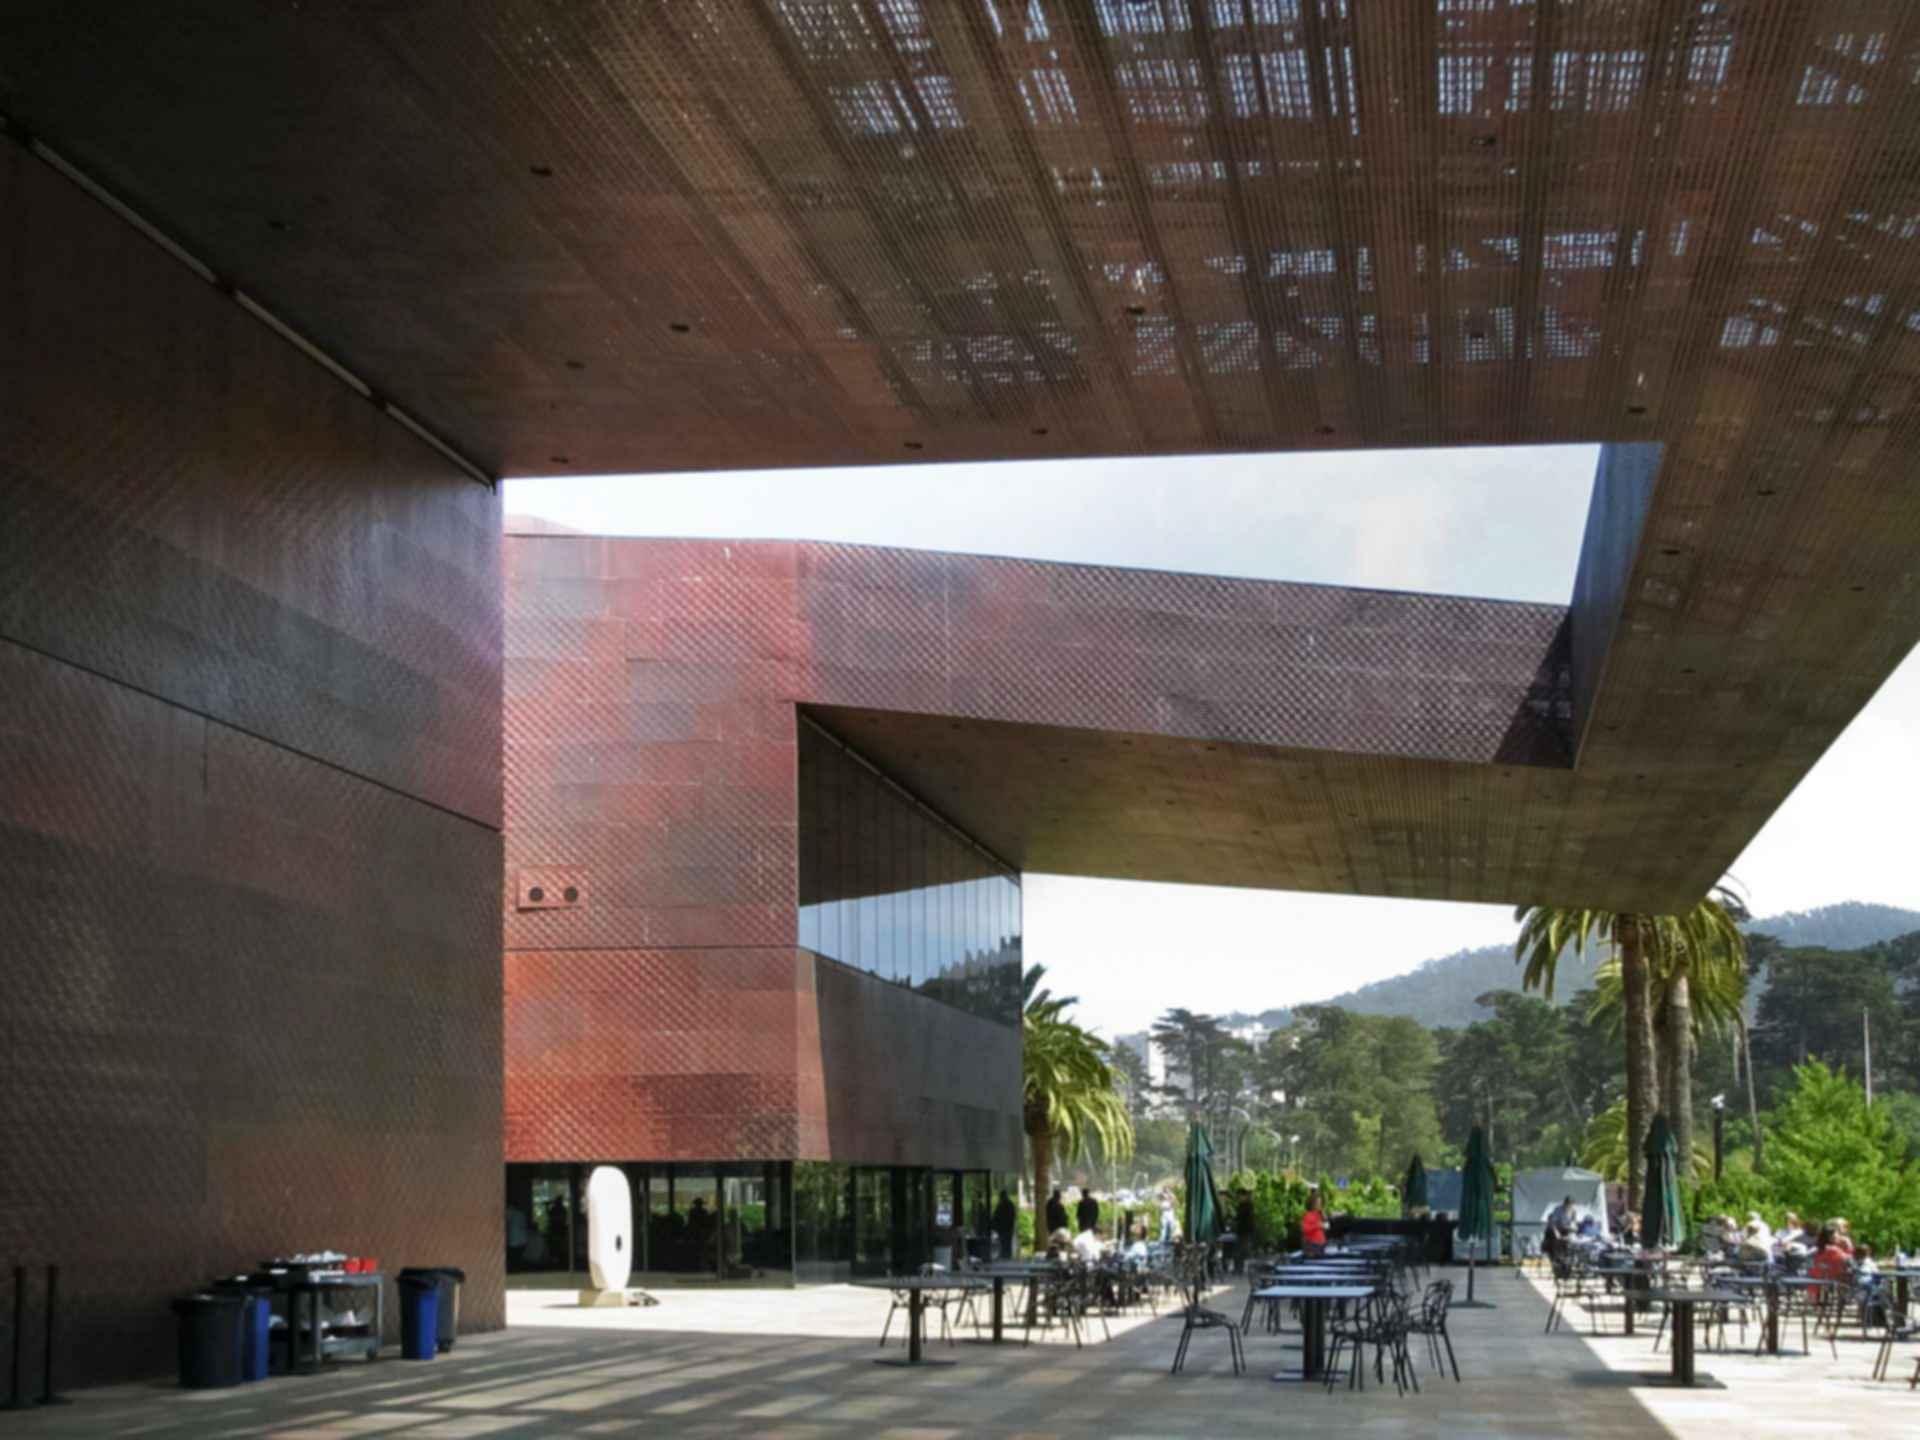 De Young Museum - Exterior/Outdoor Area